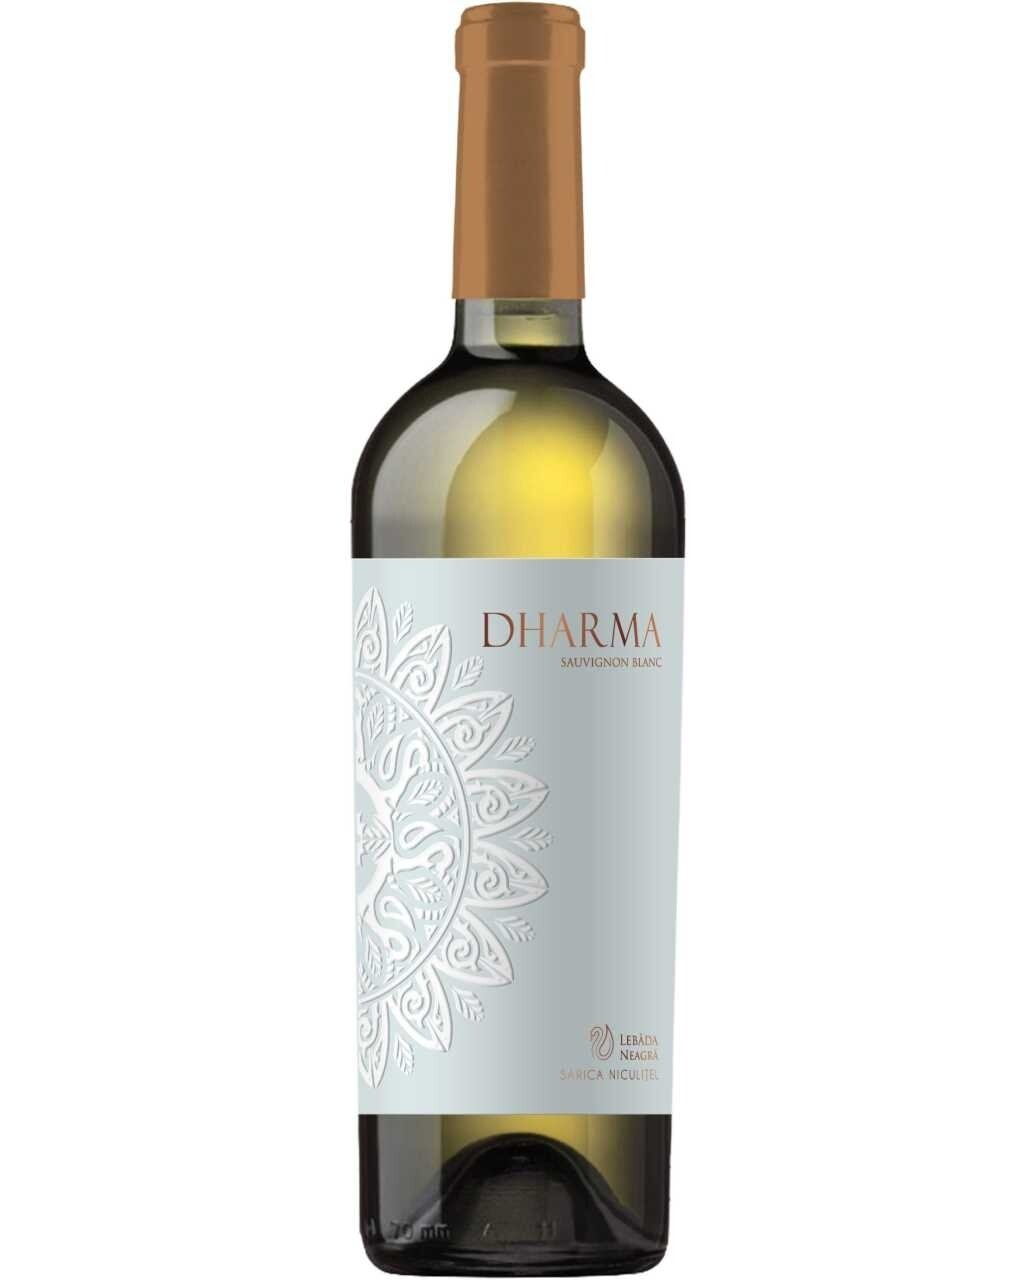 Lebada Neagra Dharma Sauvignon Blanc